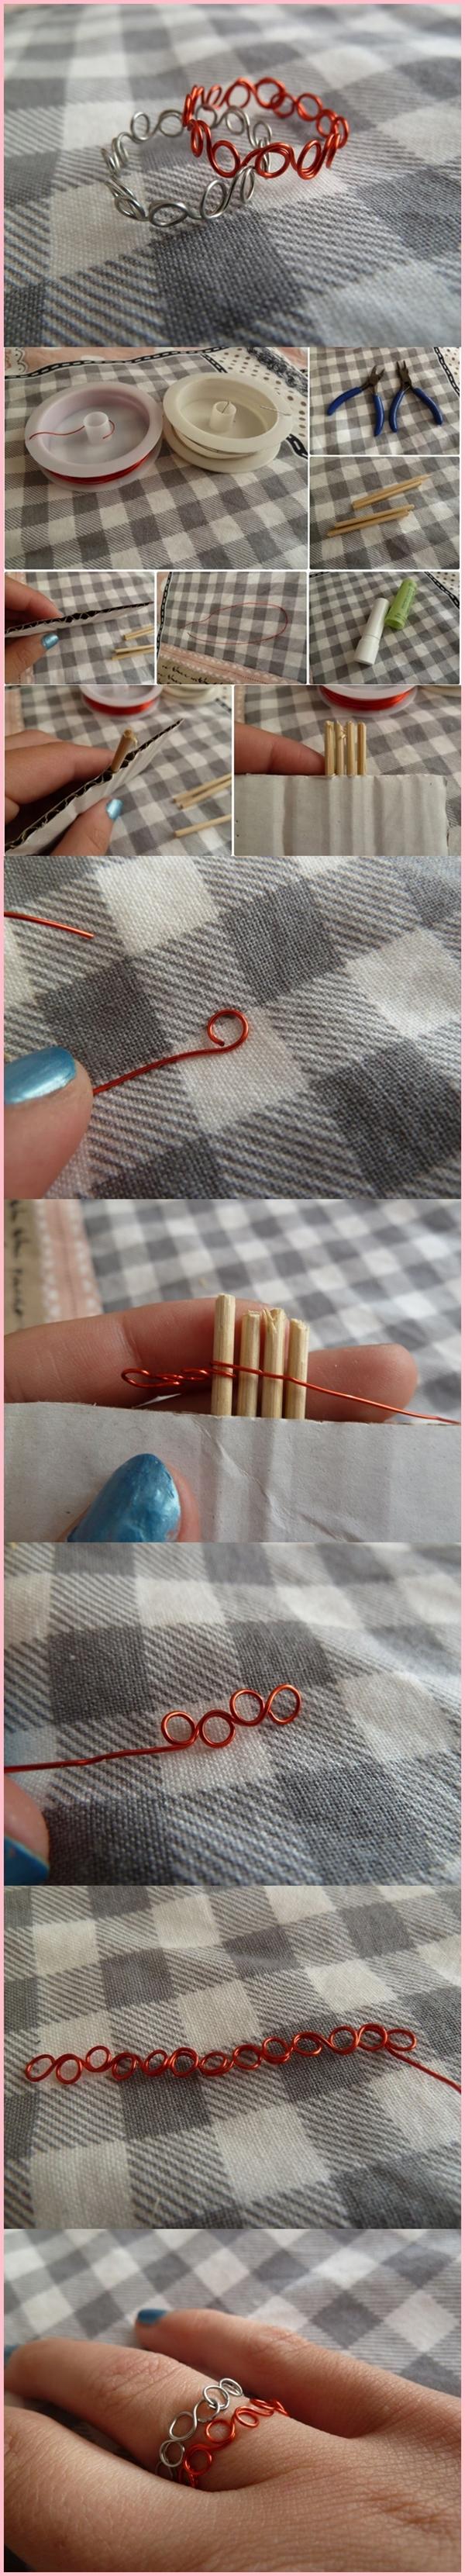 easy-peasy-diy-wire-rings-tutorials-for-teens